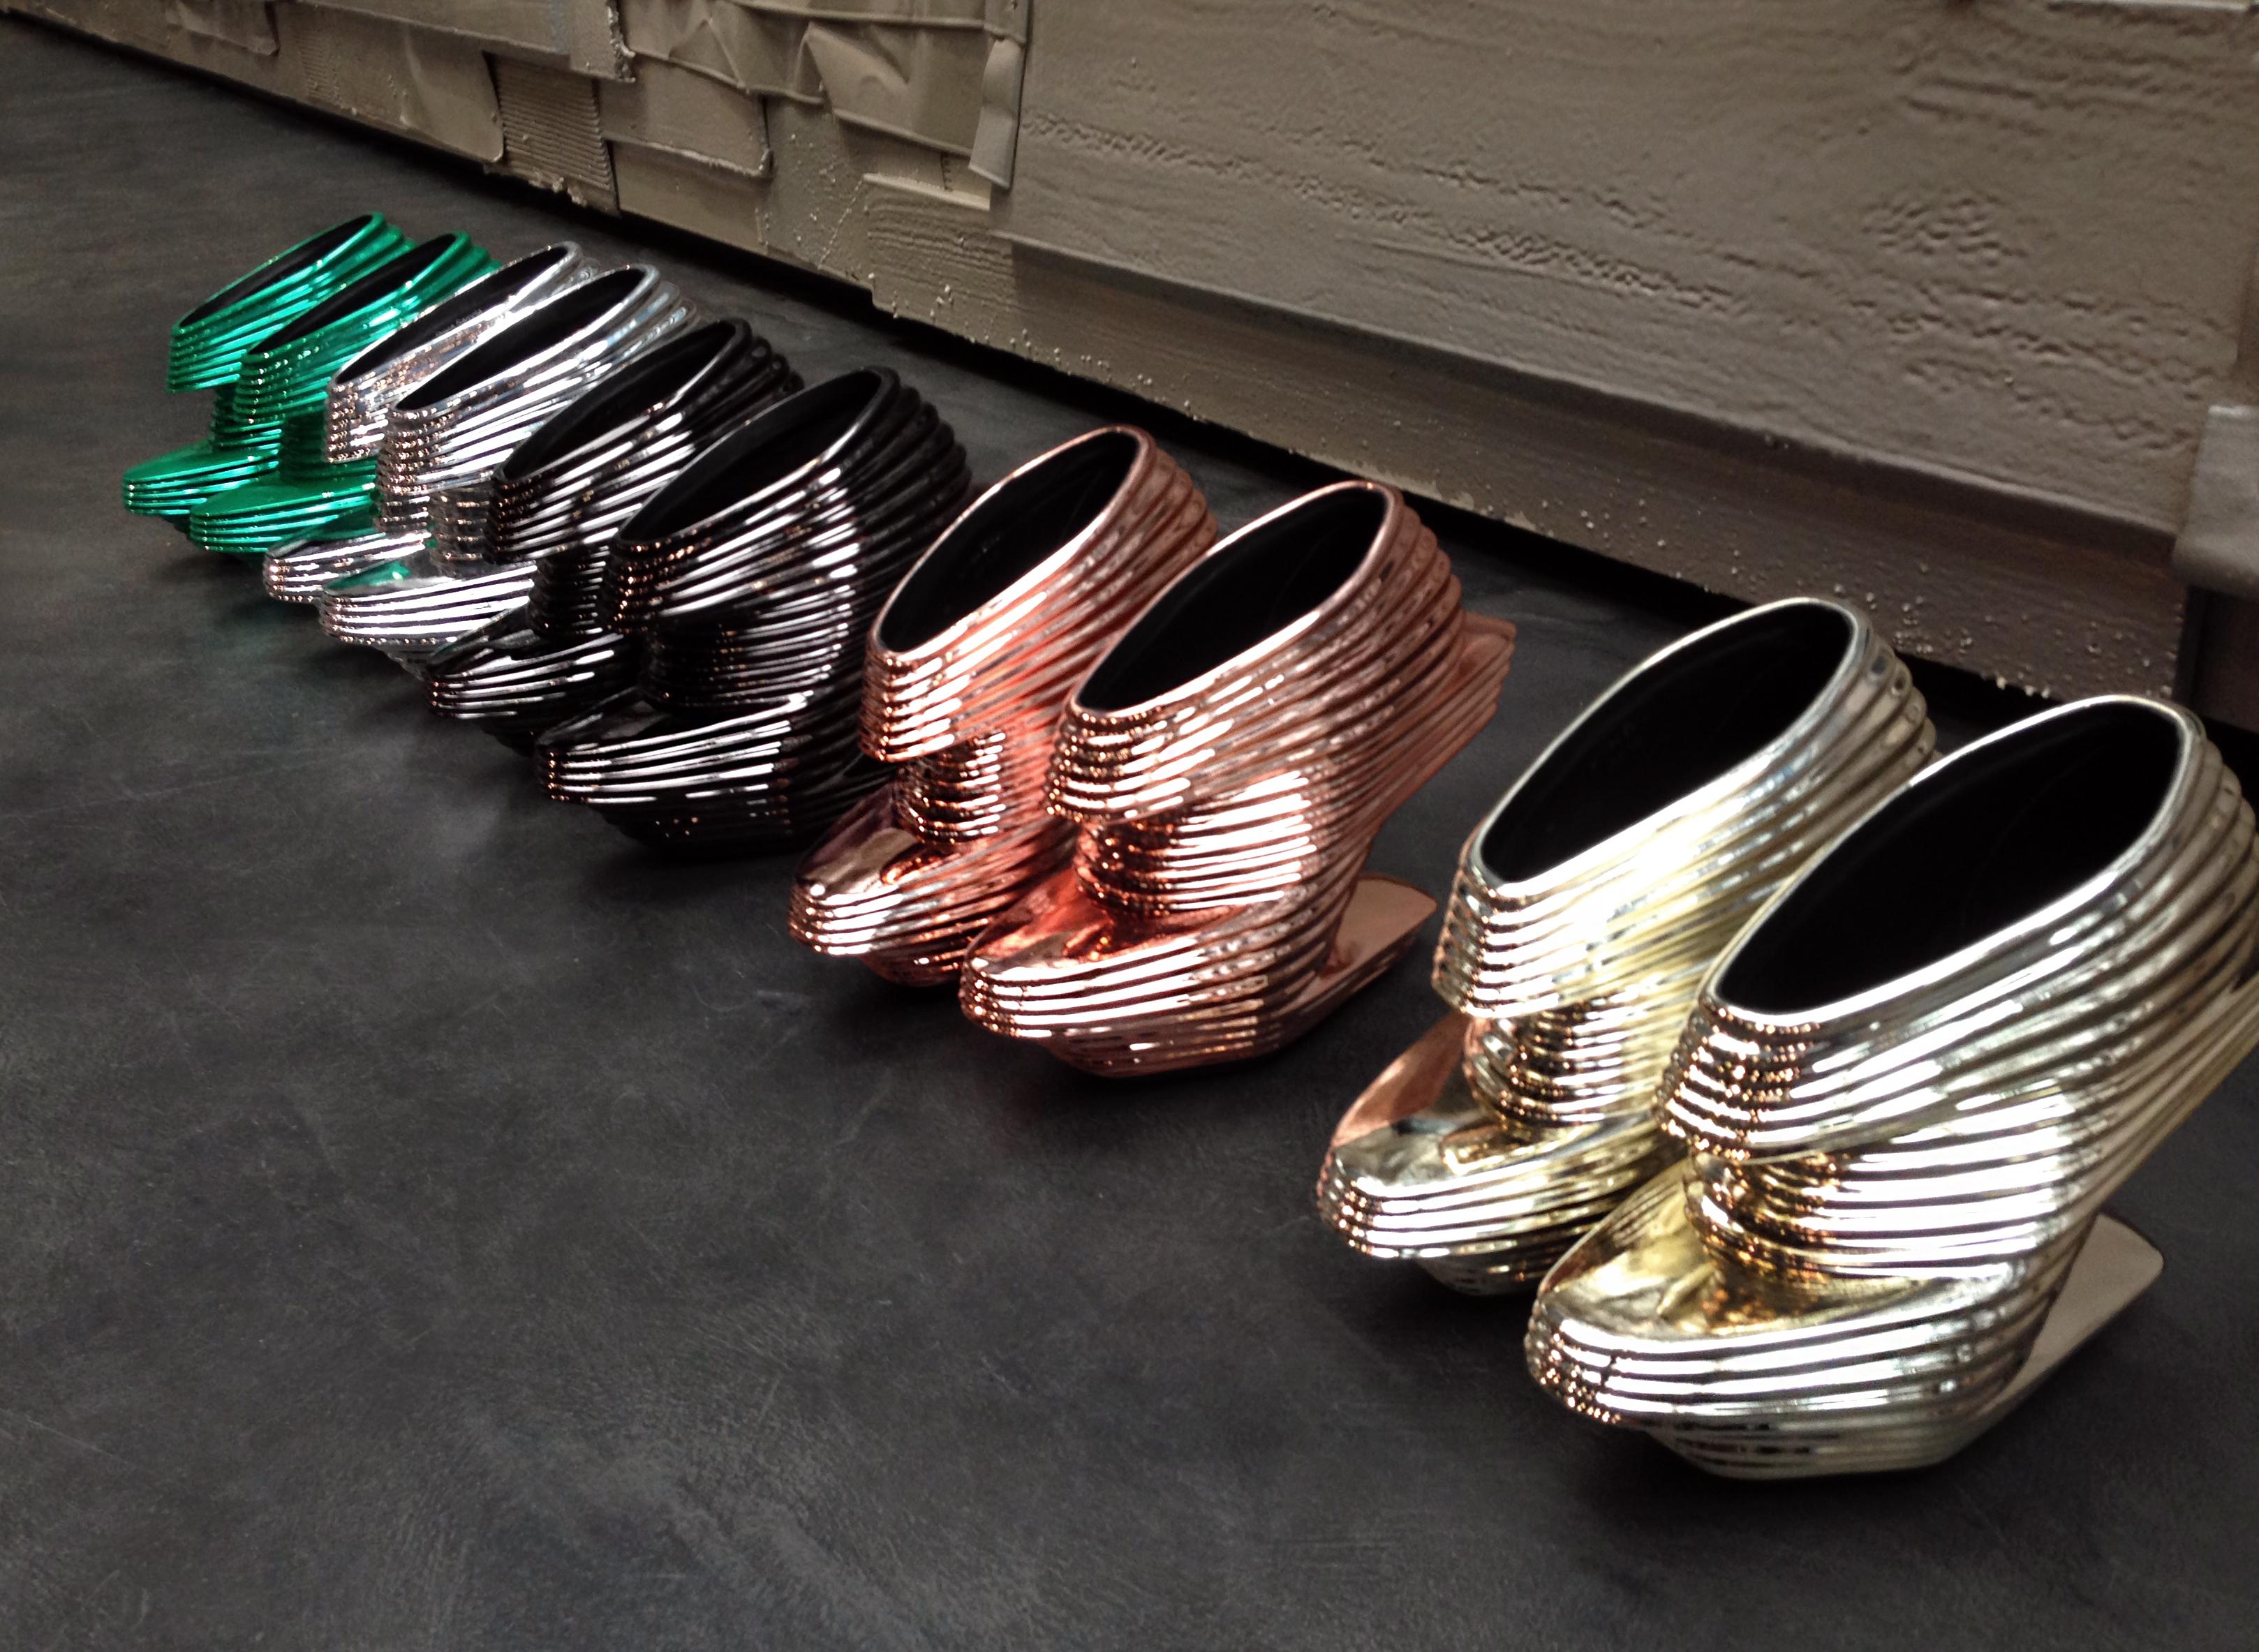 Zaha Hadid Escaparate Del Dise O # Muebles De Zaha Hadid